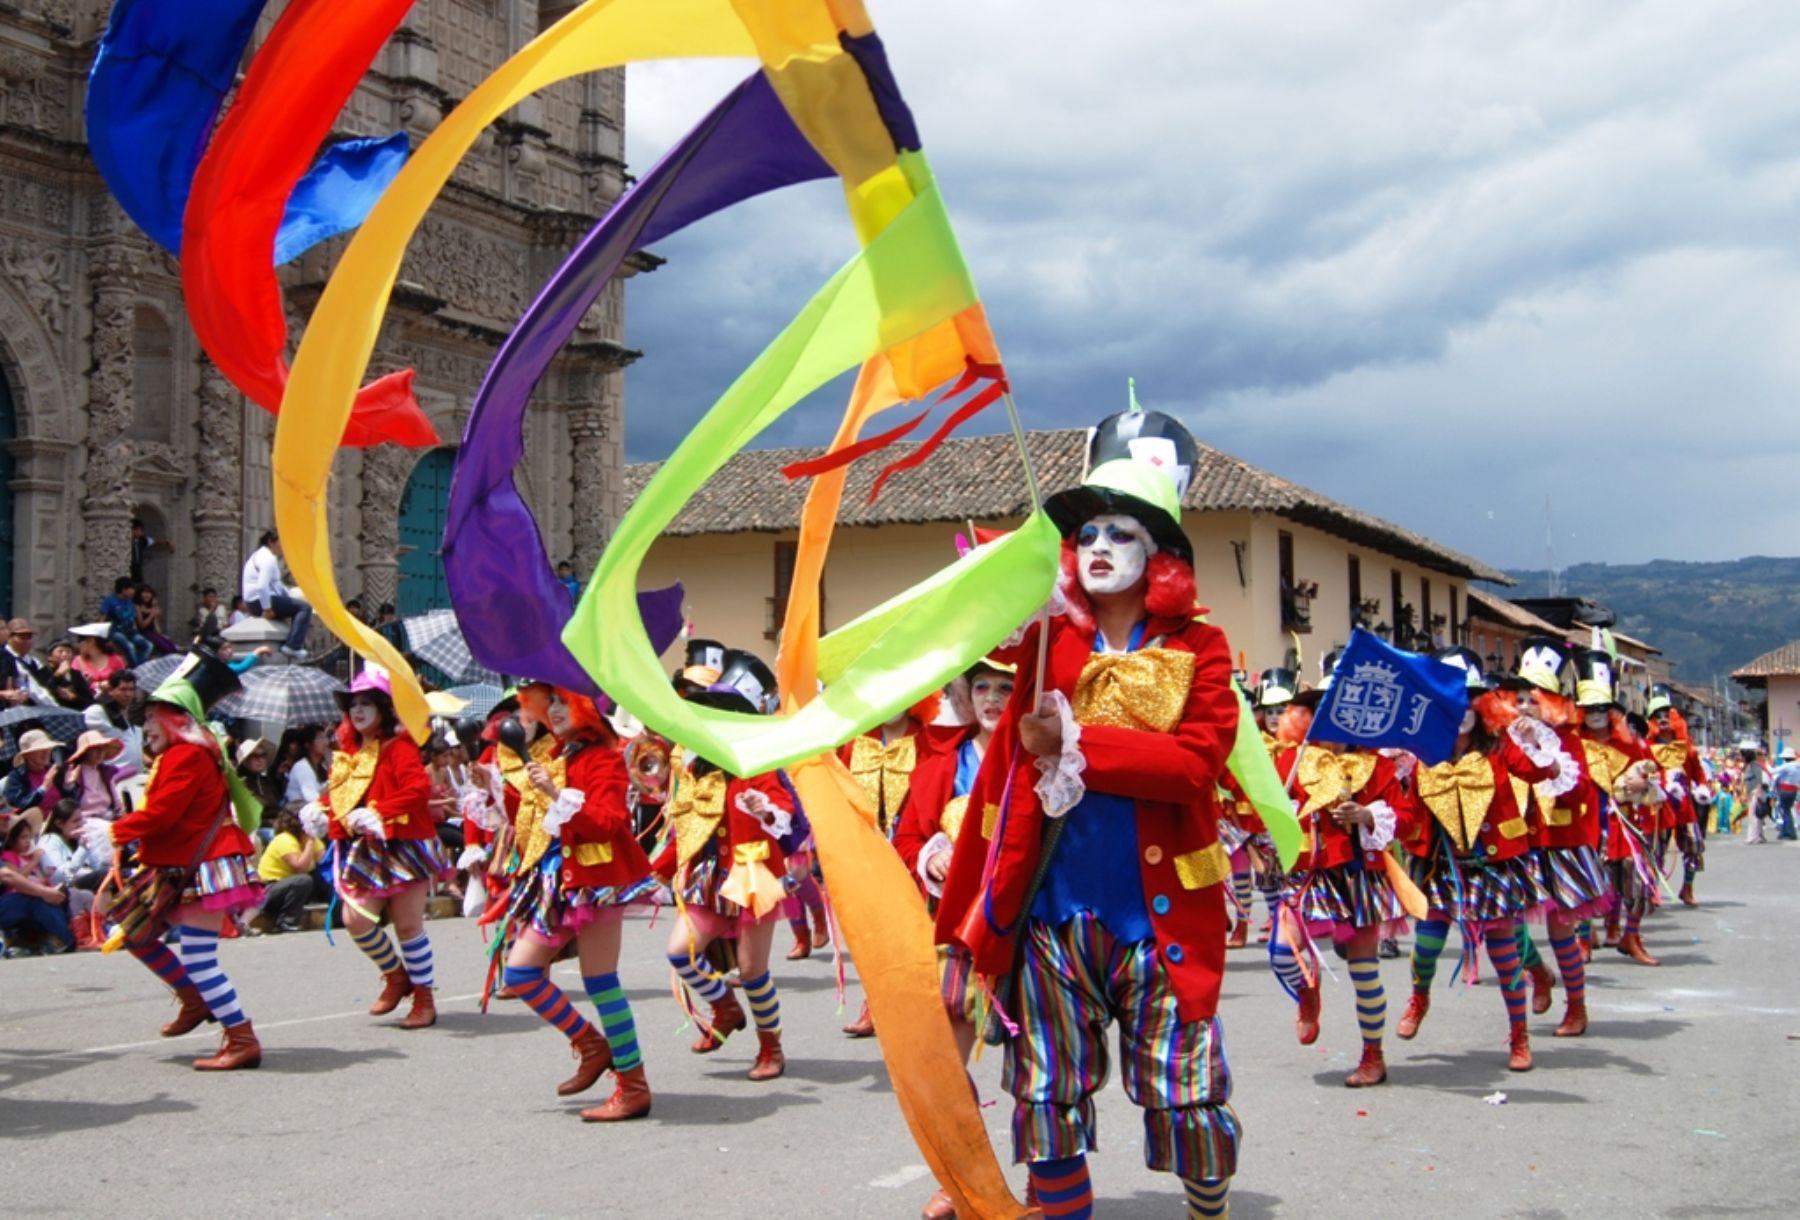 Carnaval de cajamarca 2020 - calles